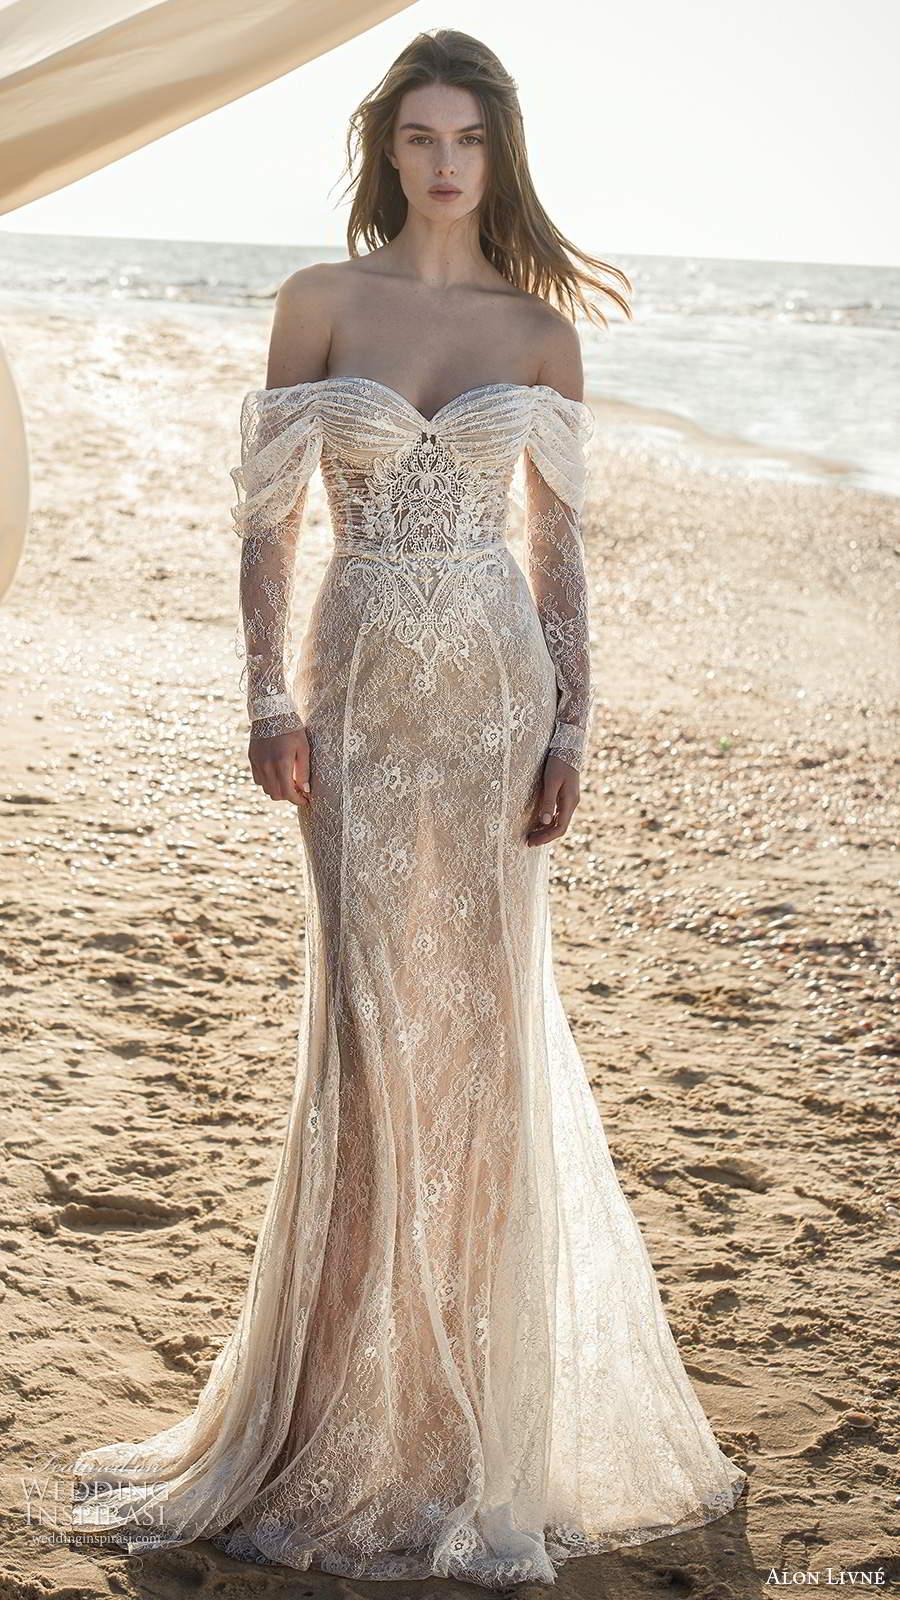 alon livne fall 2020 bridal illusion long sleeves off shoulder sweetheart neckline sheer bodice embellished lace fit flare mermaid wedding dress (3) mv